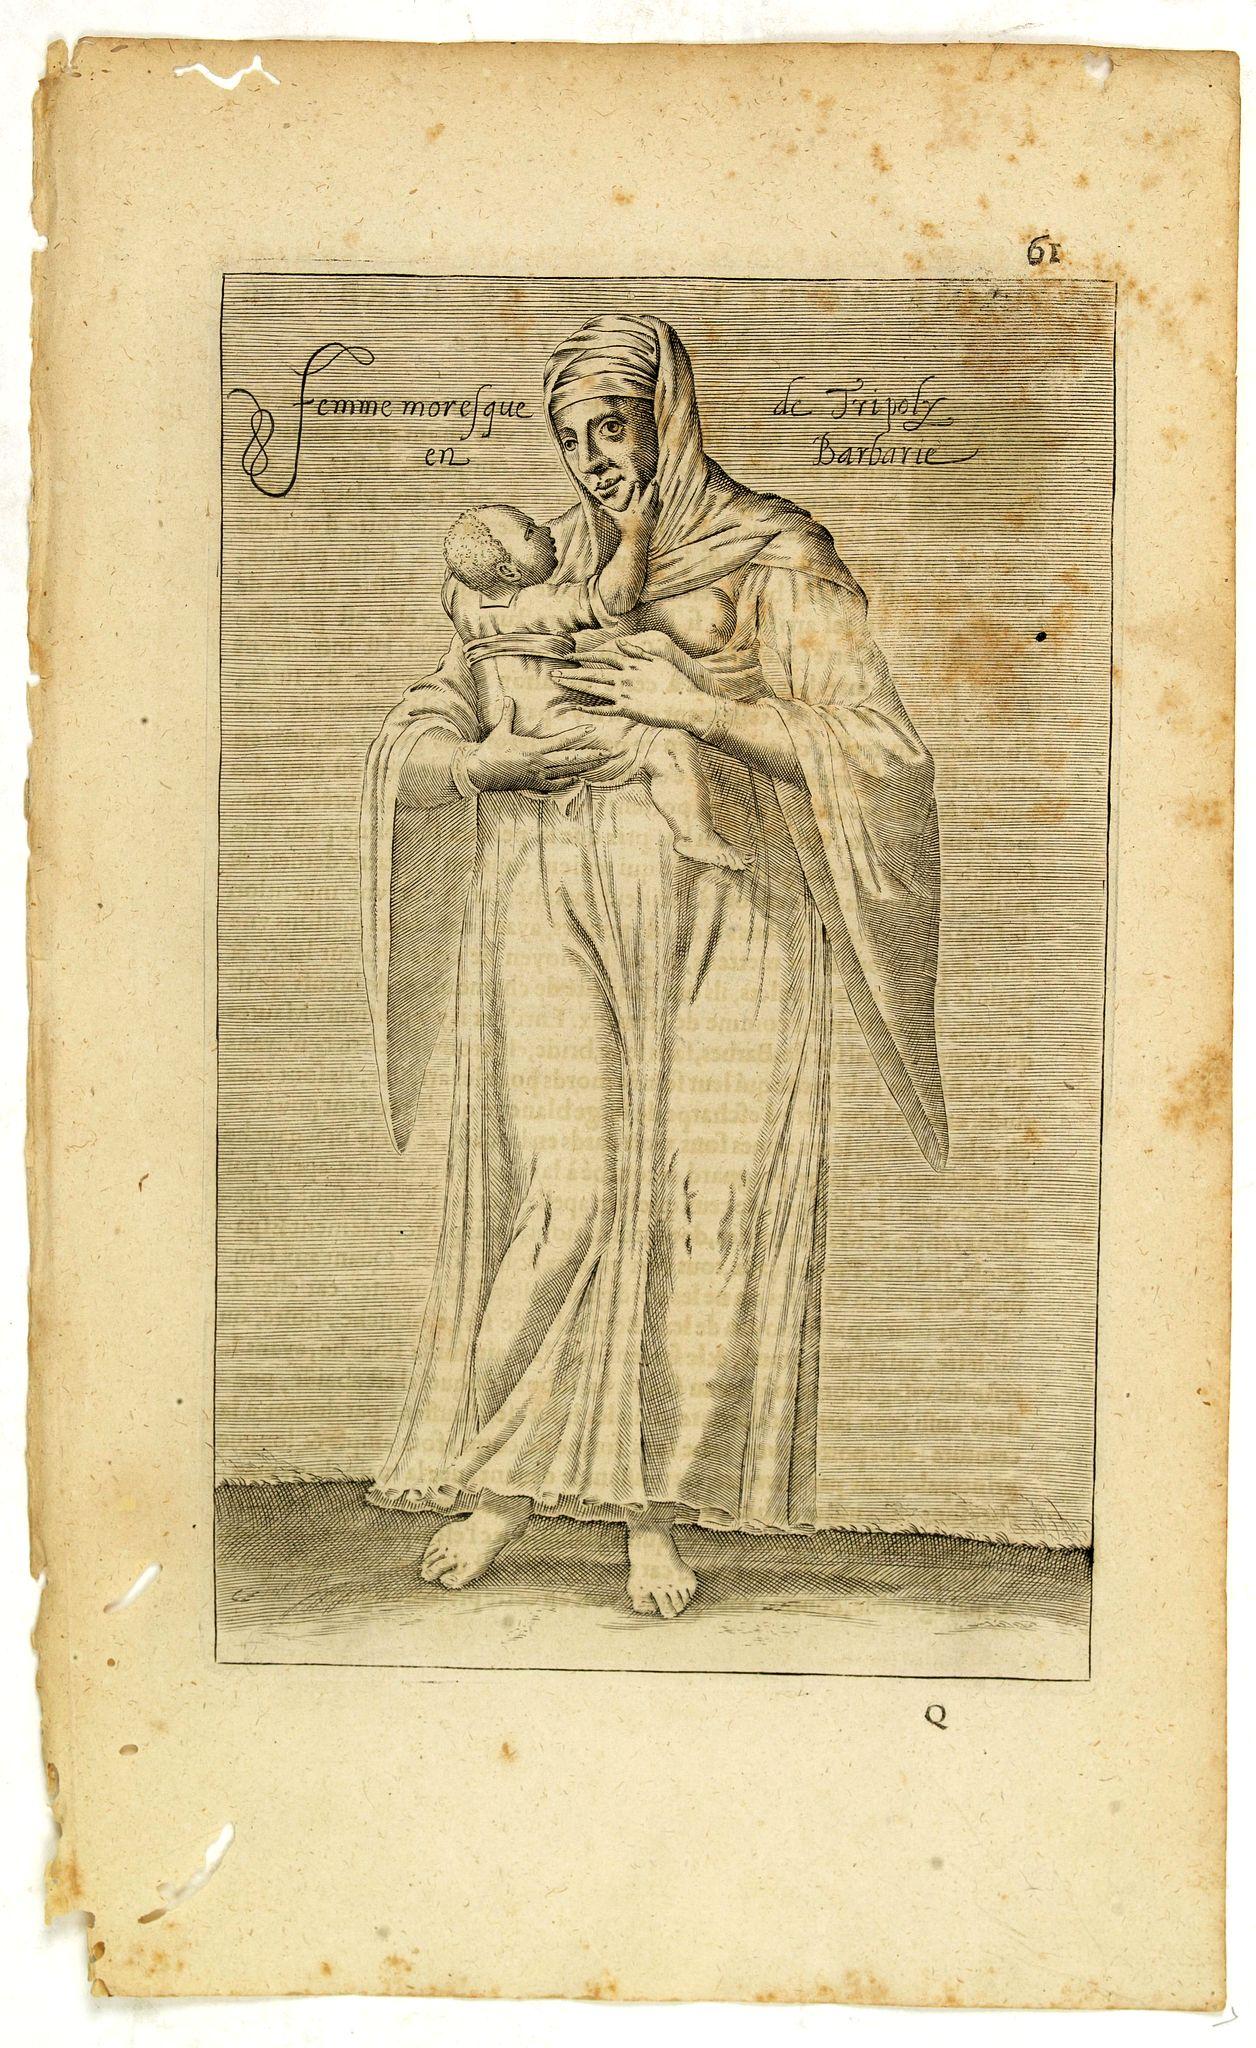 NICOLAS DE NICOLAY, Thomas Artus (sieur d'Embry). -  Femme moresque de Tripoly en Barbarie. (61)